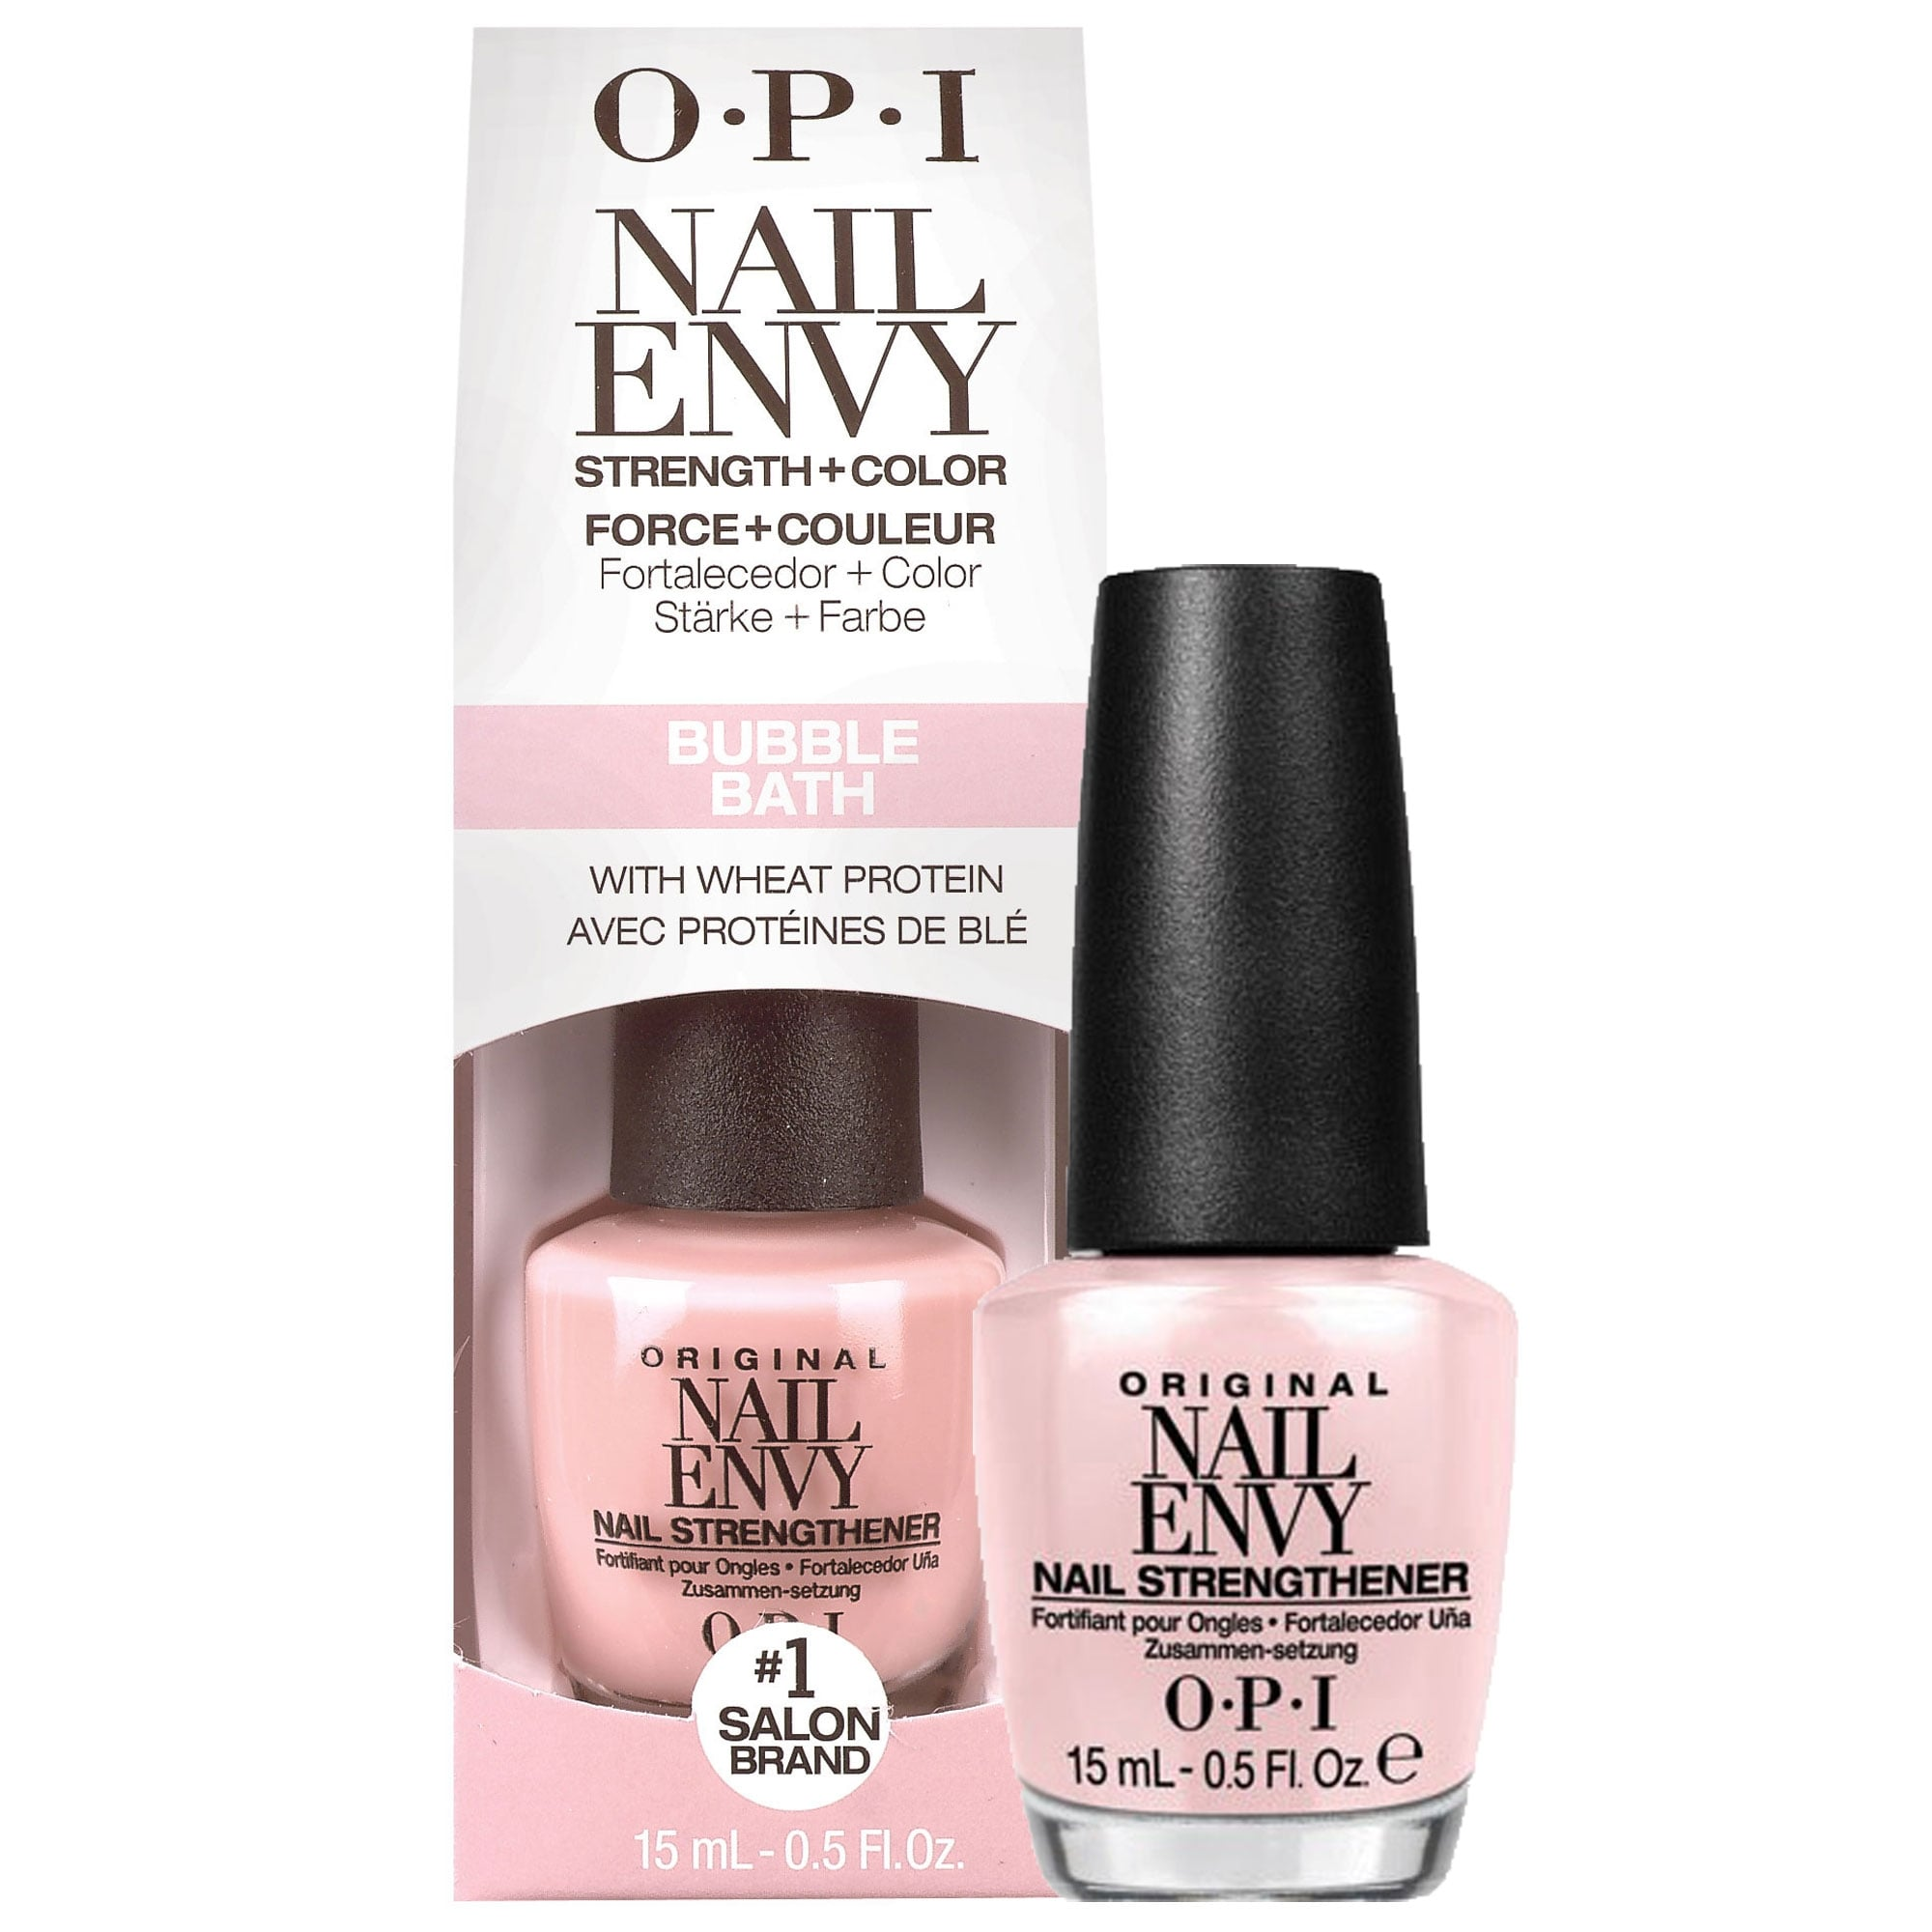 Opi Nail Envy Nail Treatment Original Nail Strengthener Formula Bubble Bath Nt222 15ml